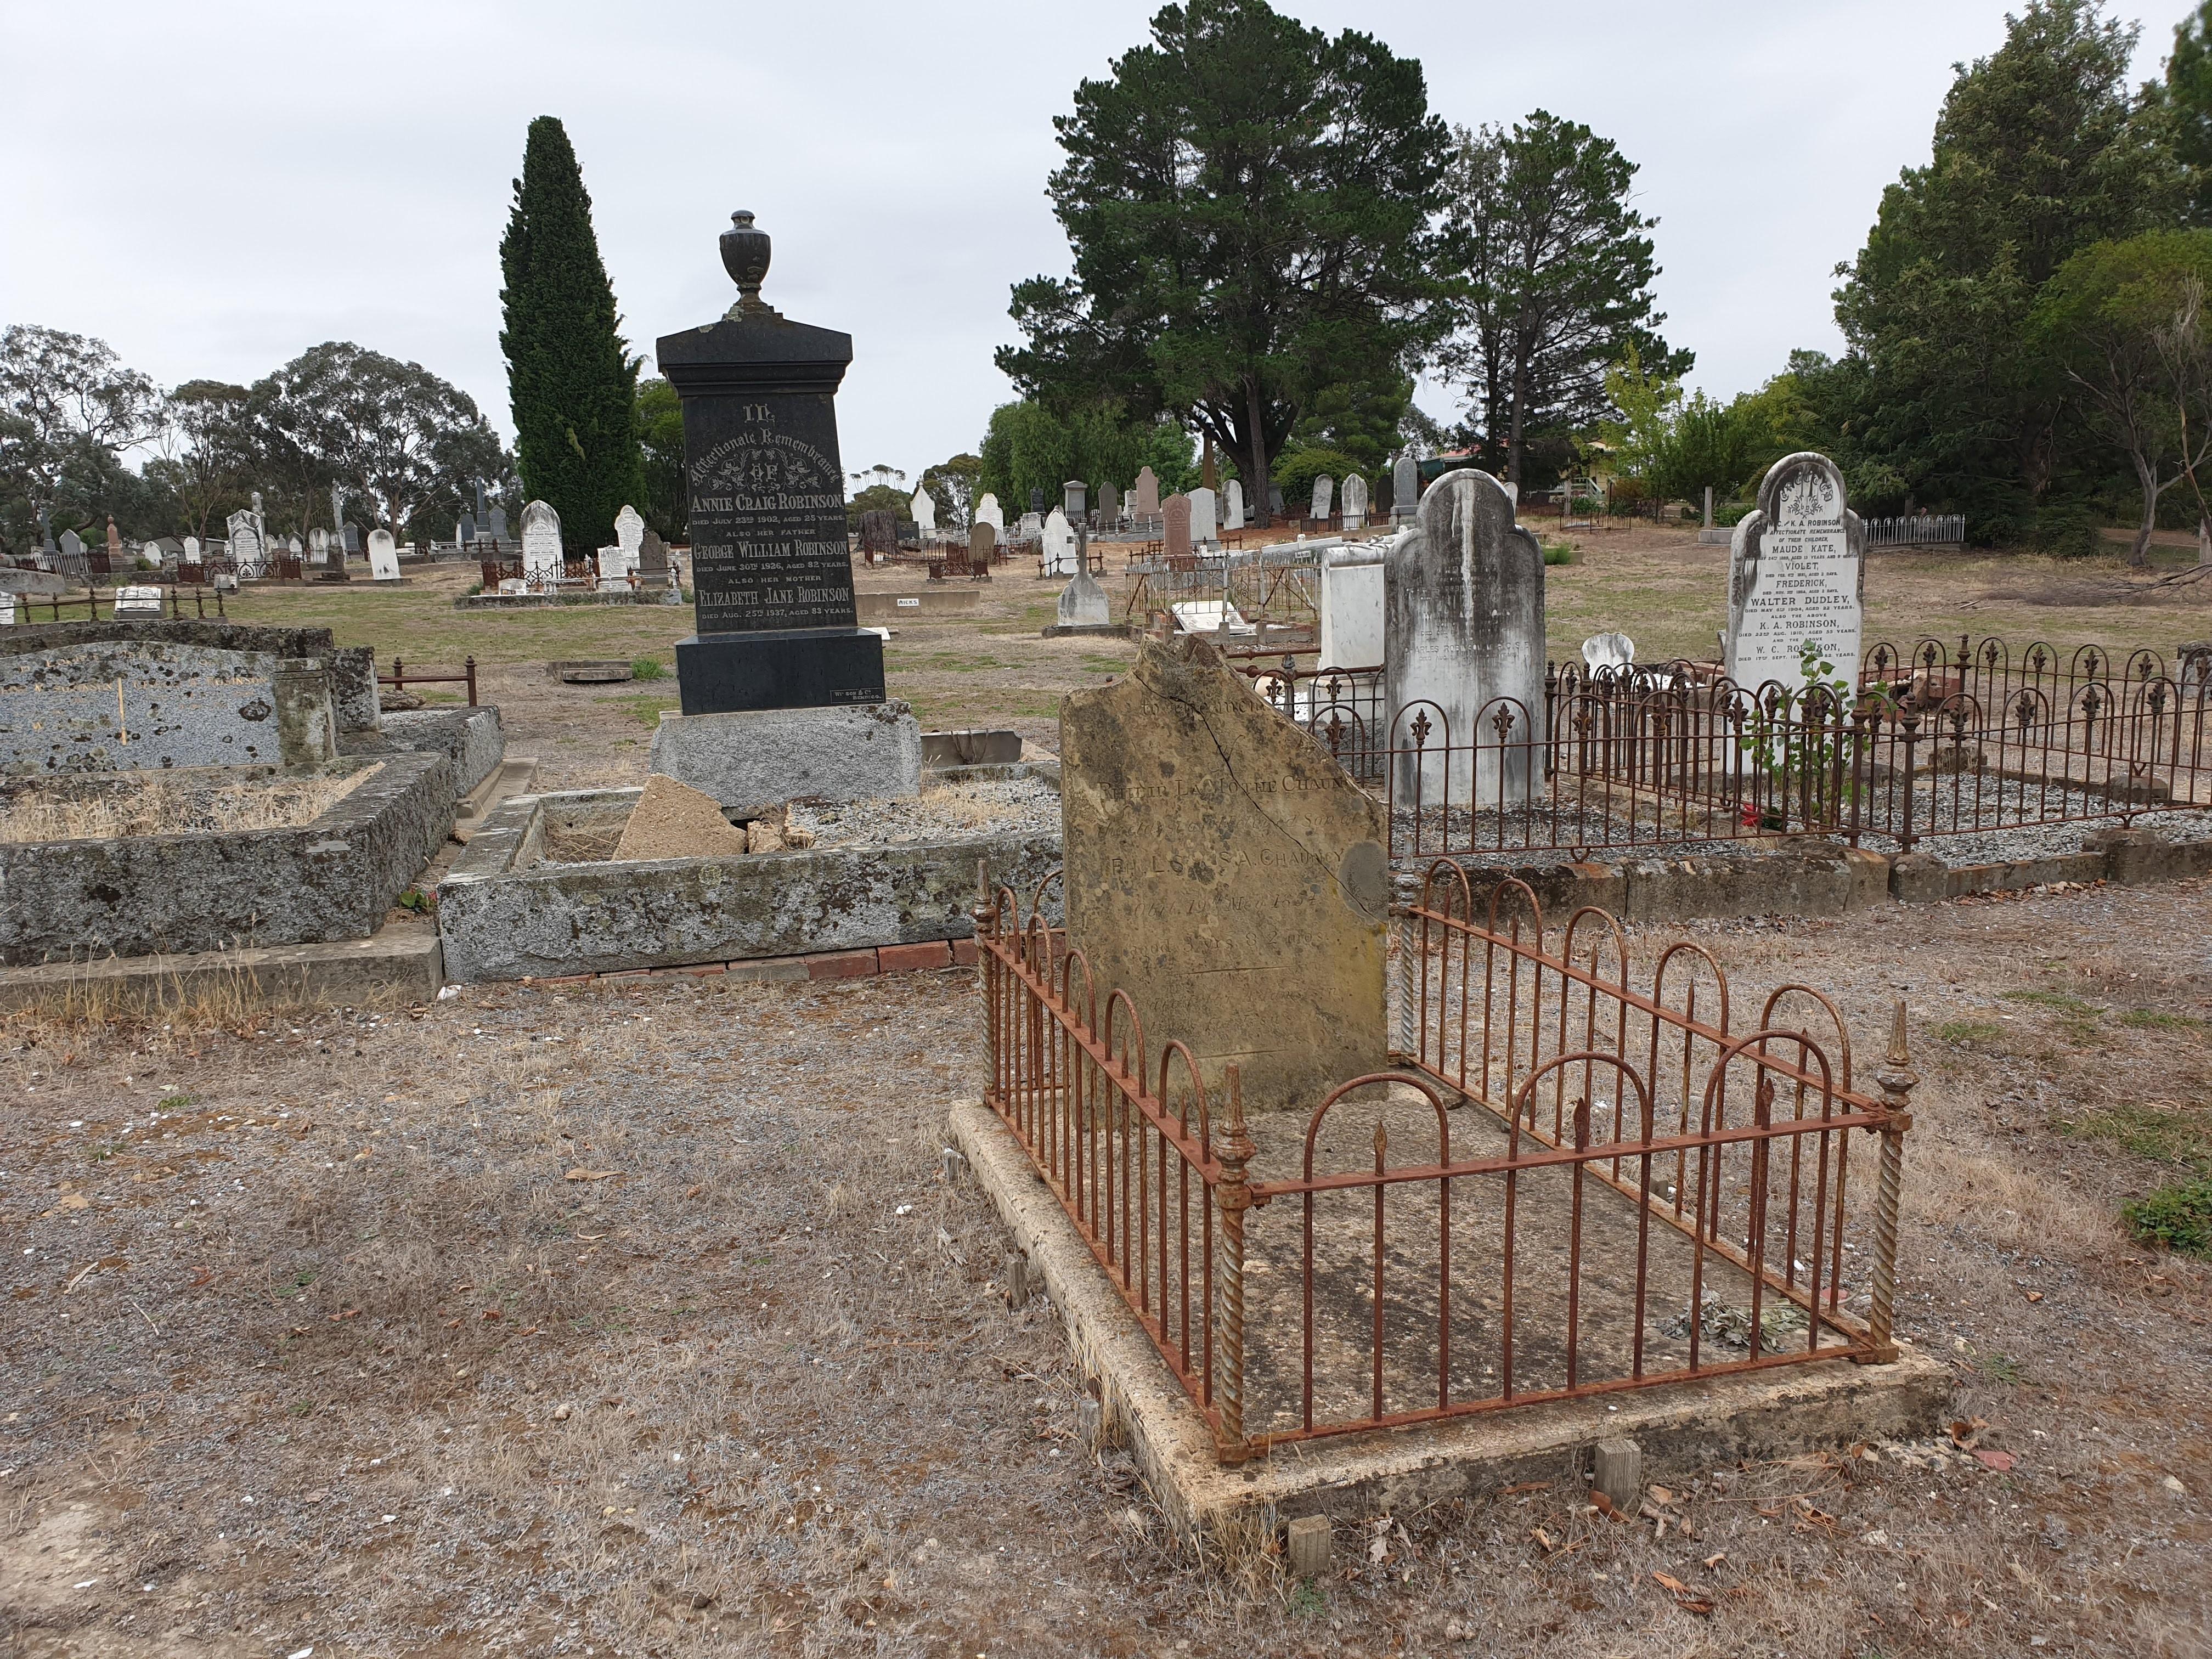 Heathcote cemetery Chauncy grave 20200304_112425